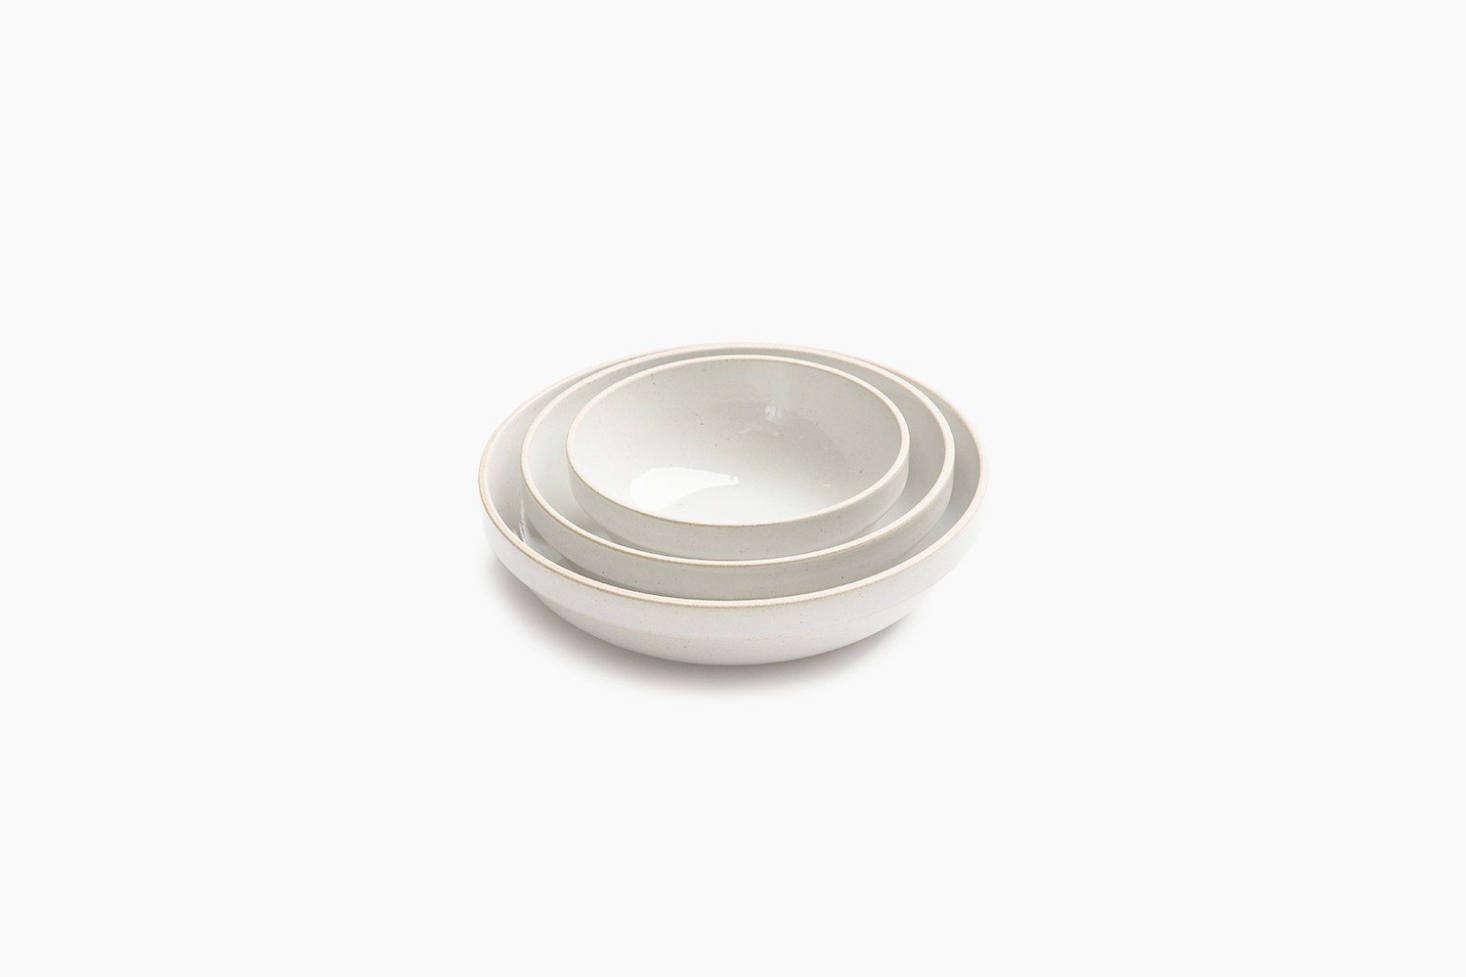 The Hasami Porcelain 7 src=